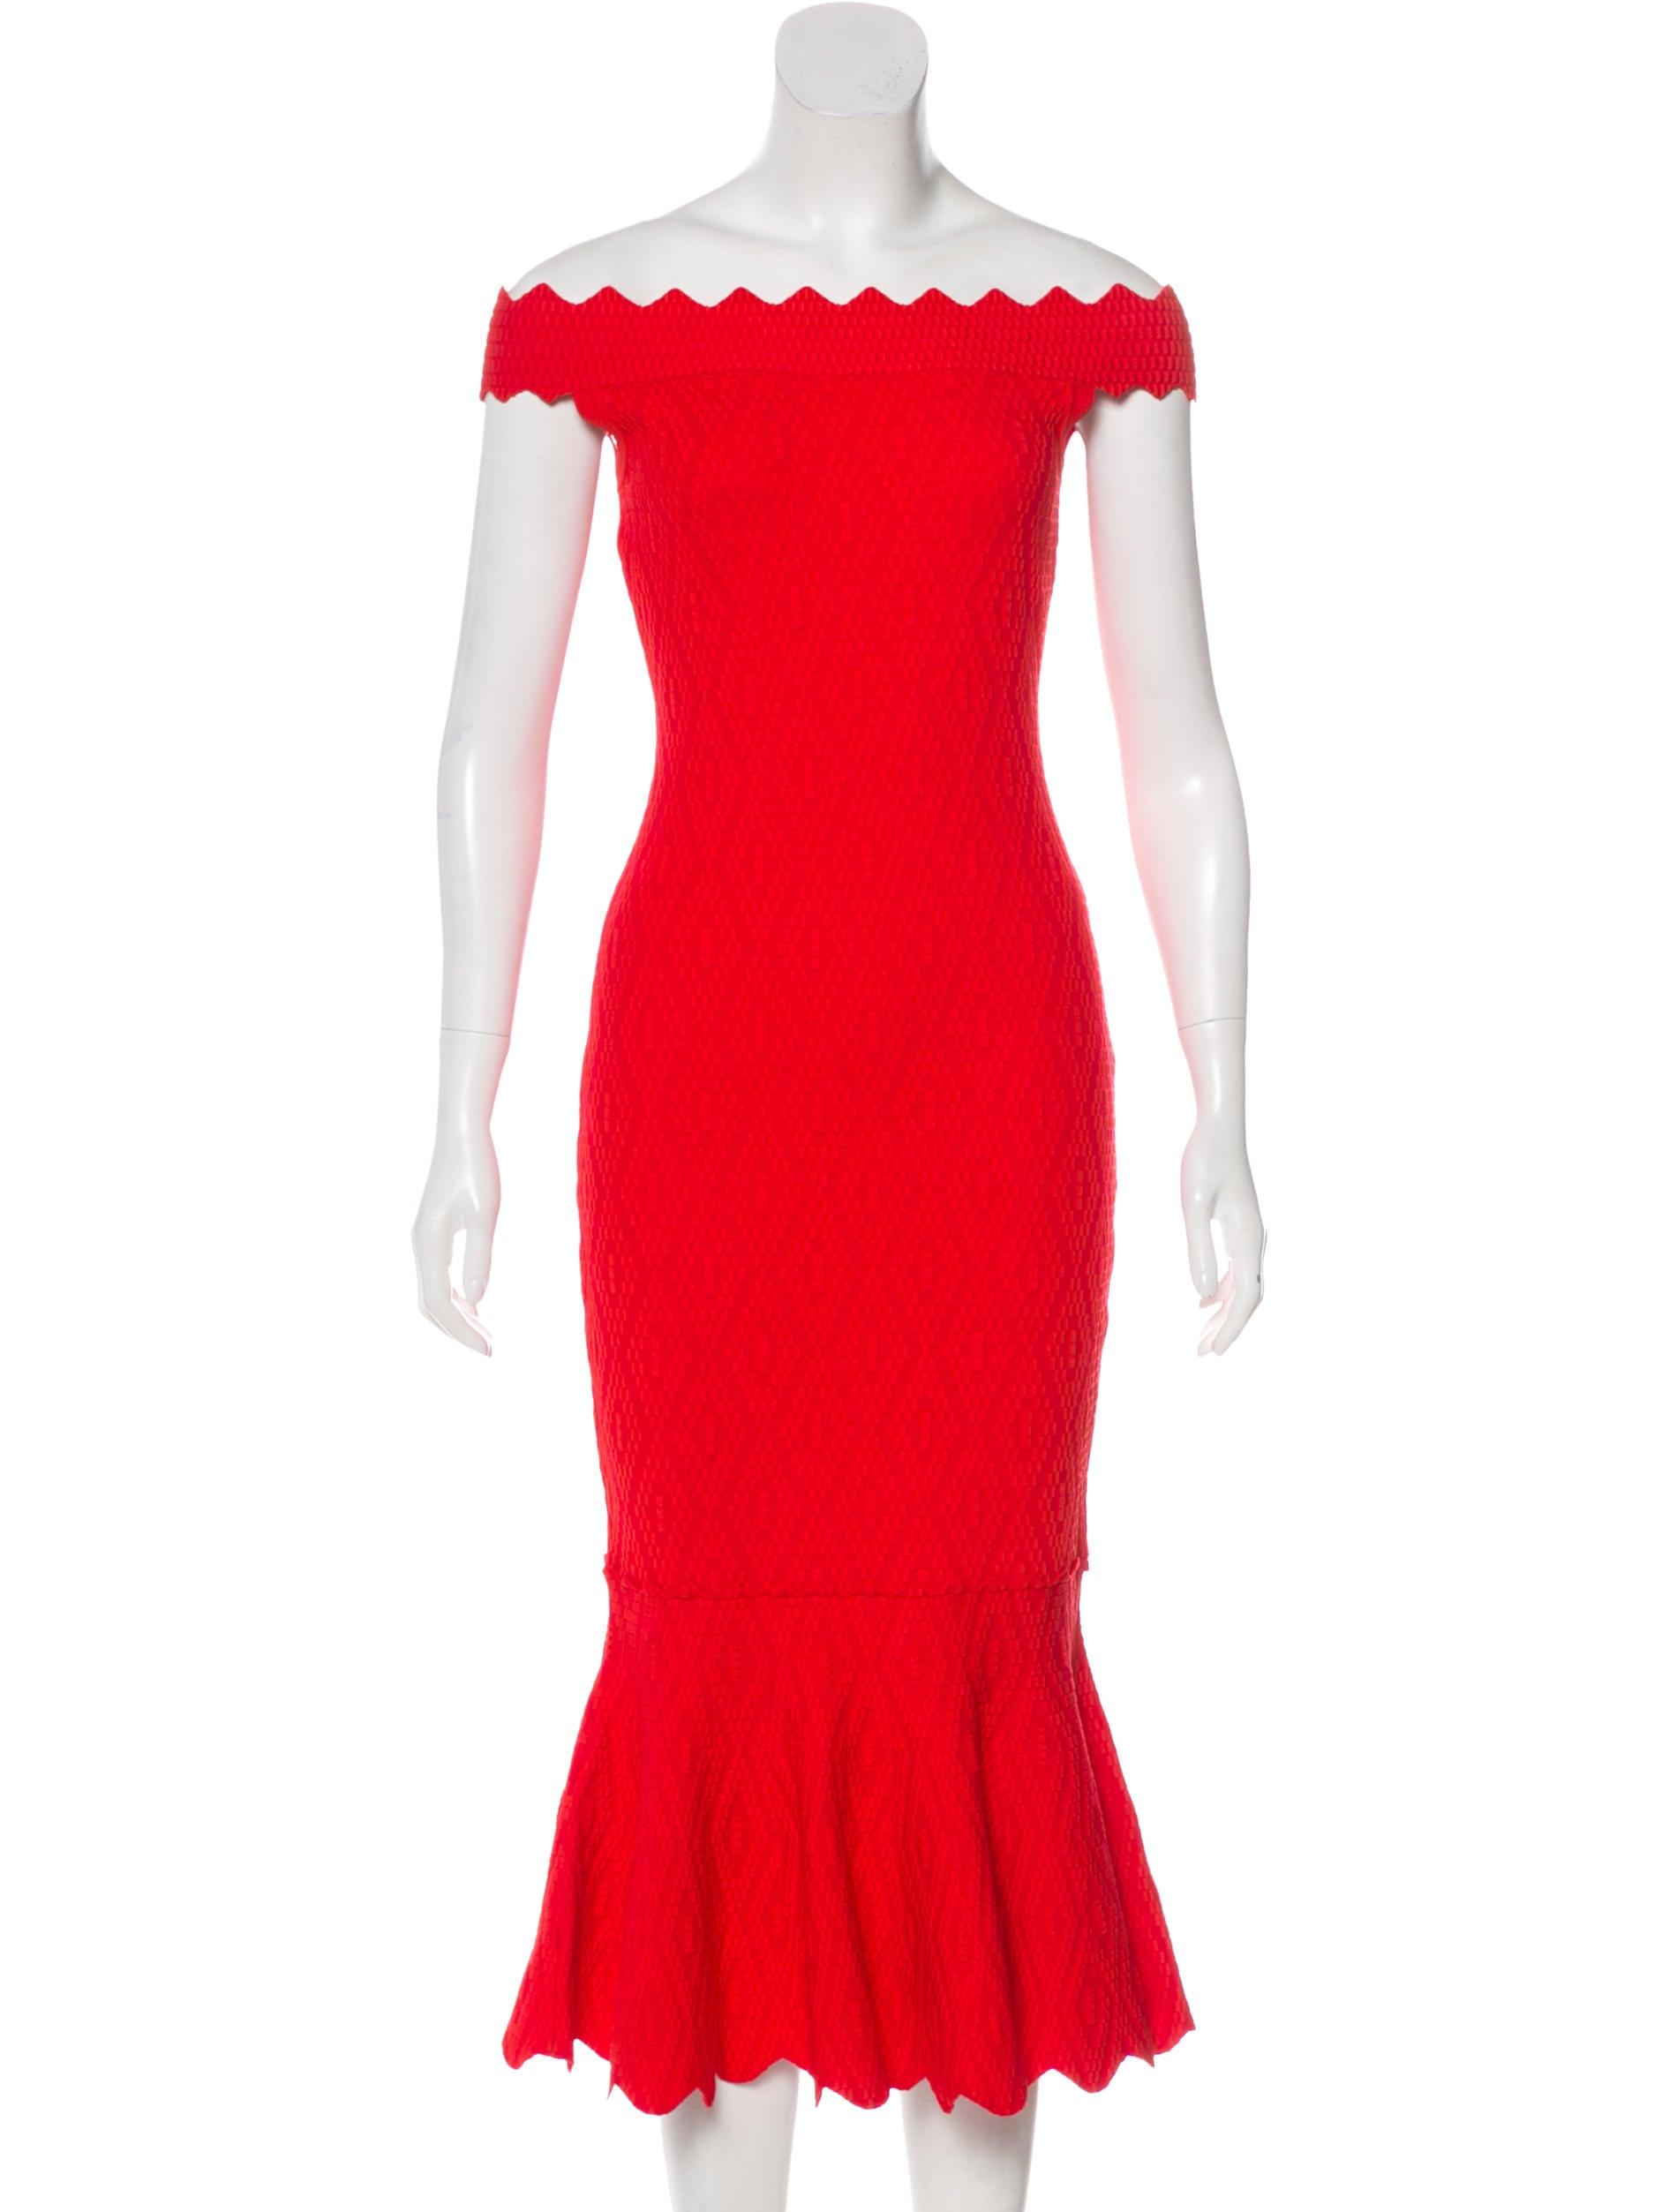 Wj023730 Geometric Jacquard Simkhai Clothing Dress Jonathan TqXvwzx